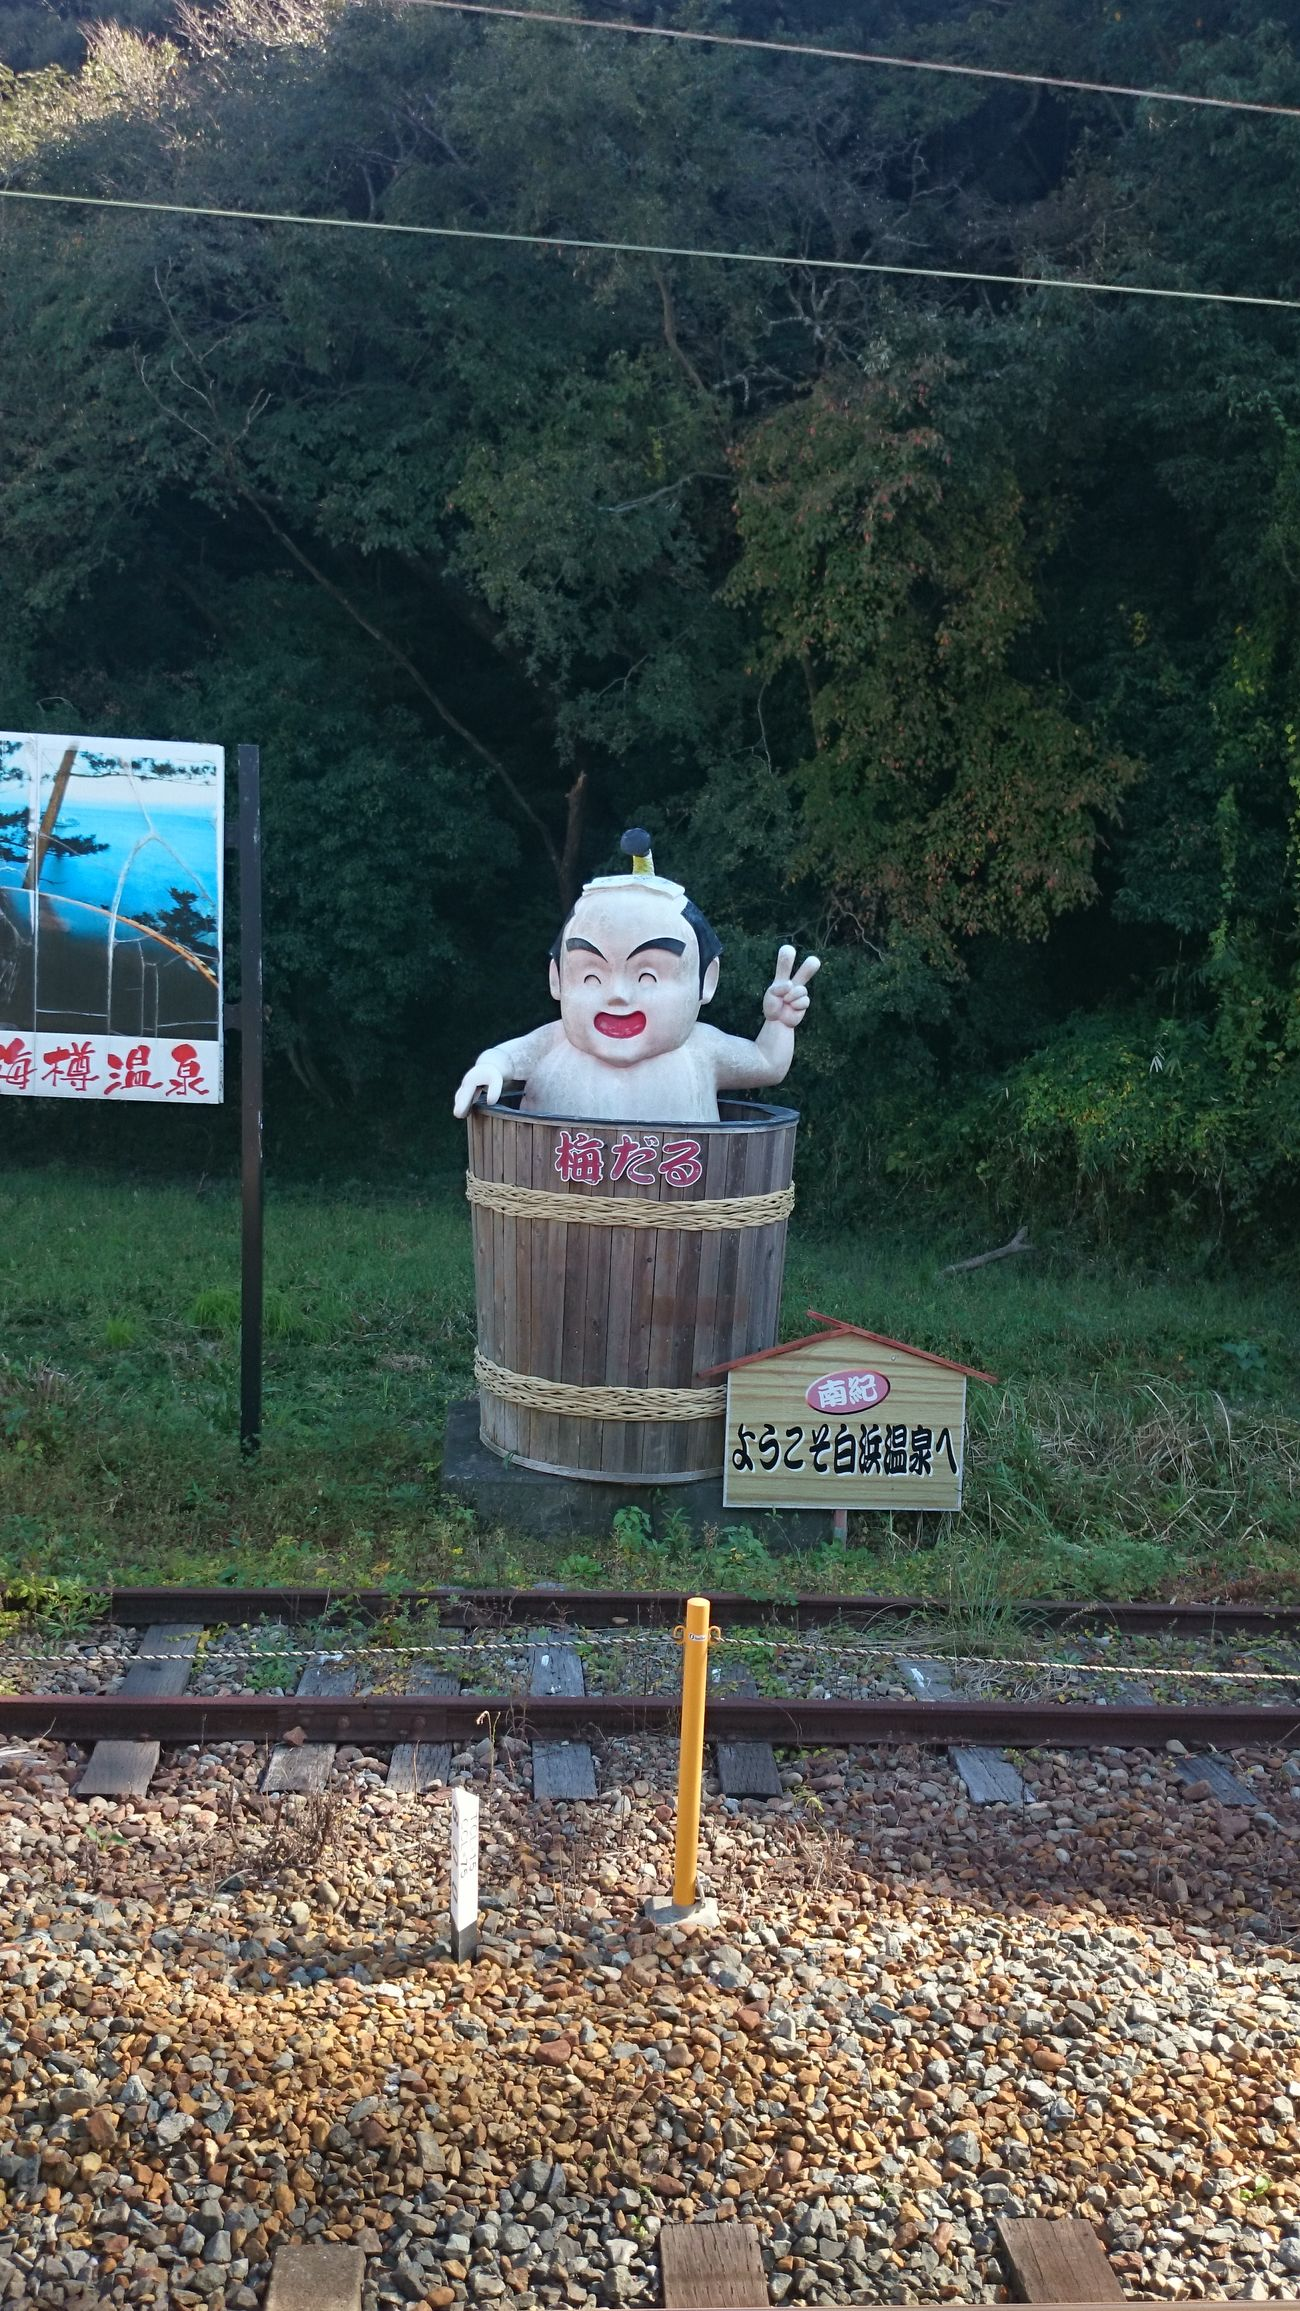 The famous hotspring symbol at Shirahama! Travel Japan EyeEm Best Shots Streamzoofamily